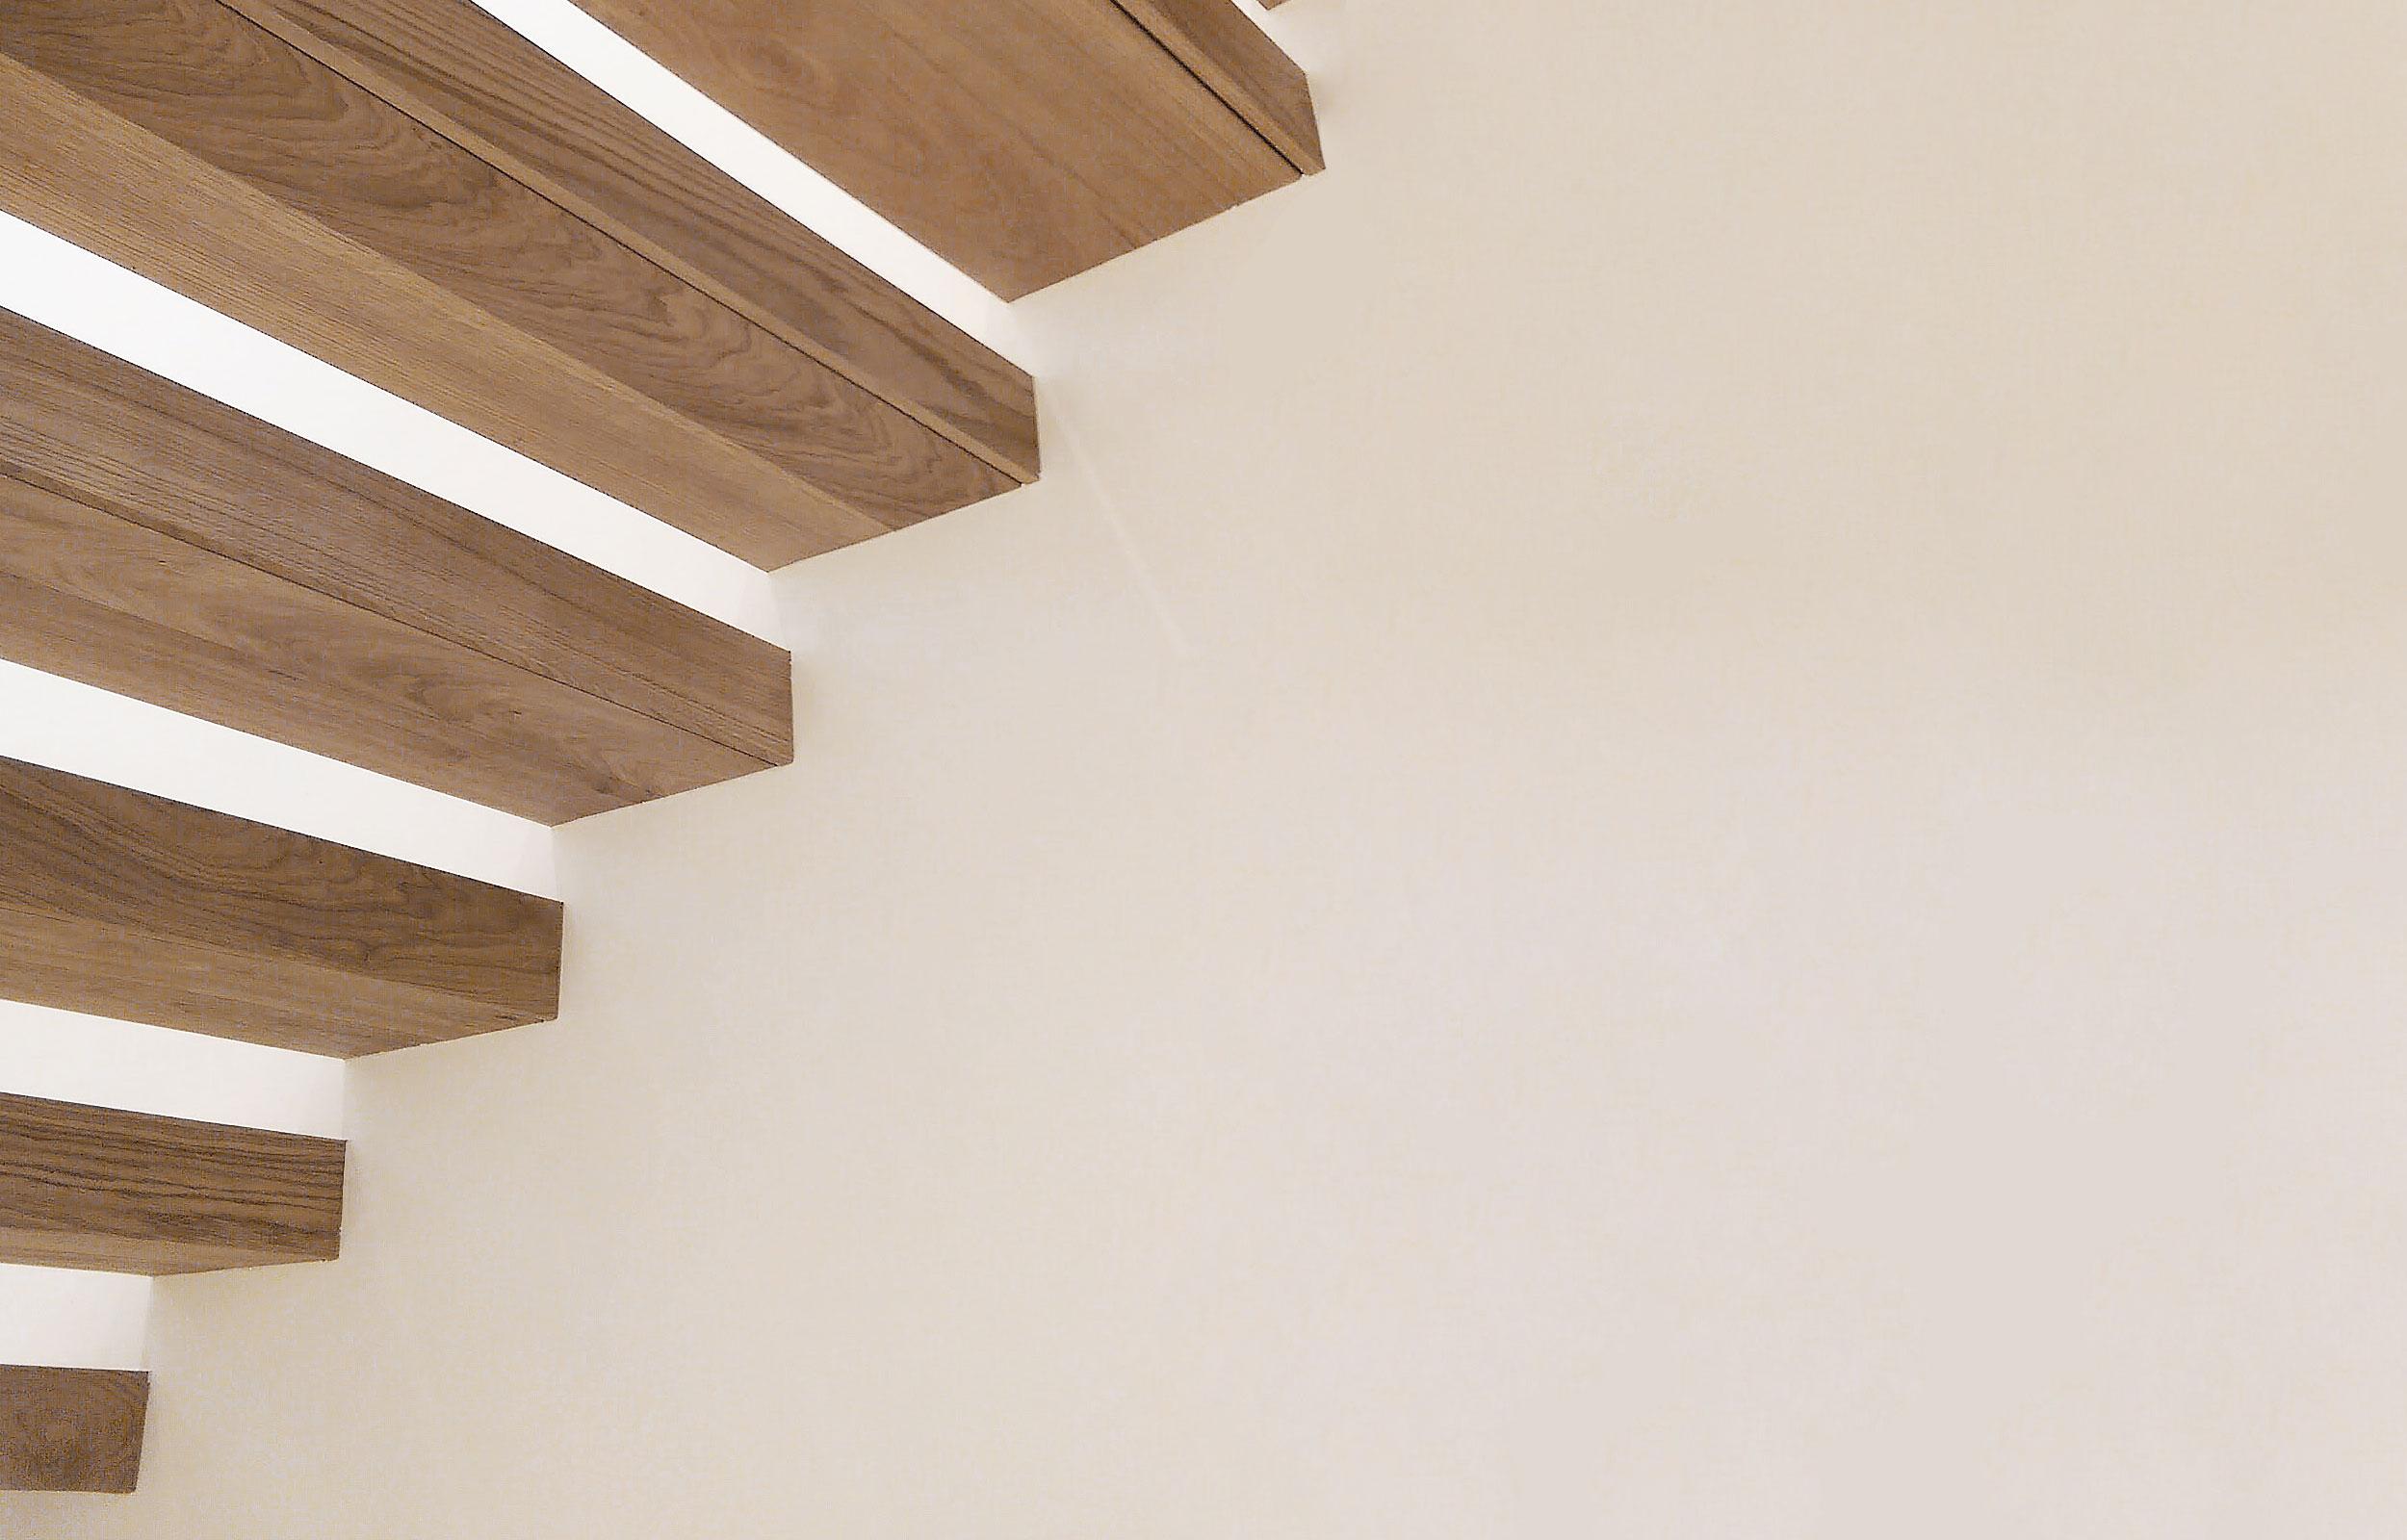 Scara trepte lemn balustrada metal flat